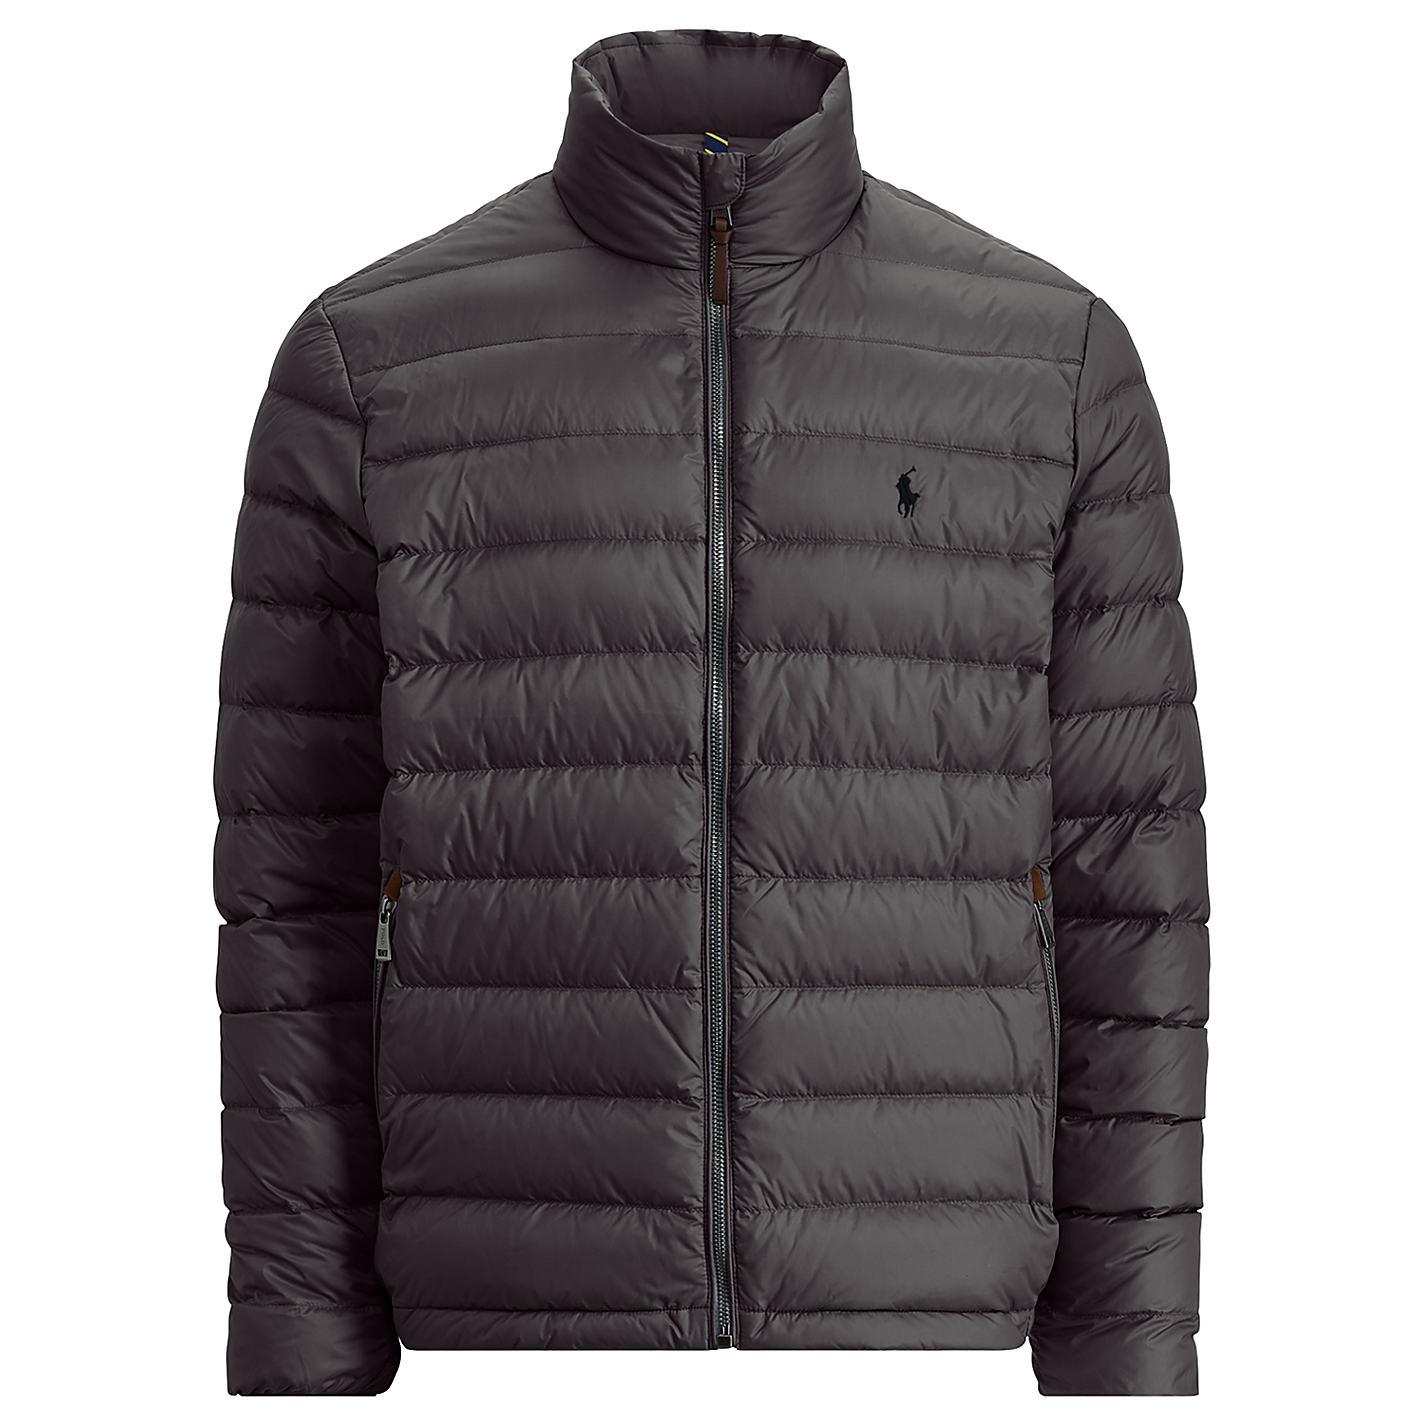 Buy Polo Ralph Lauren City Down Fill Jacket John Lewis # Muebles Ralph Lauren Espana